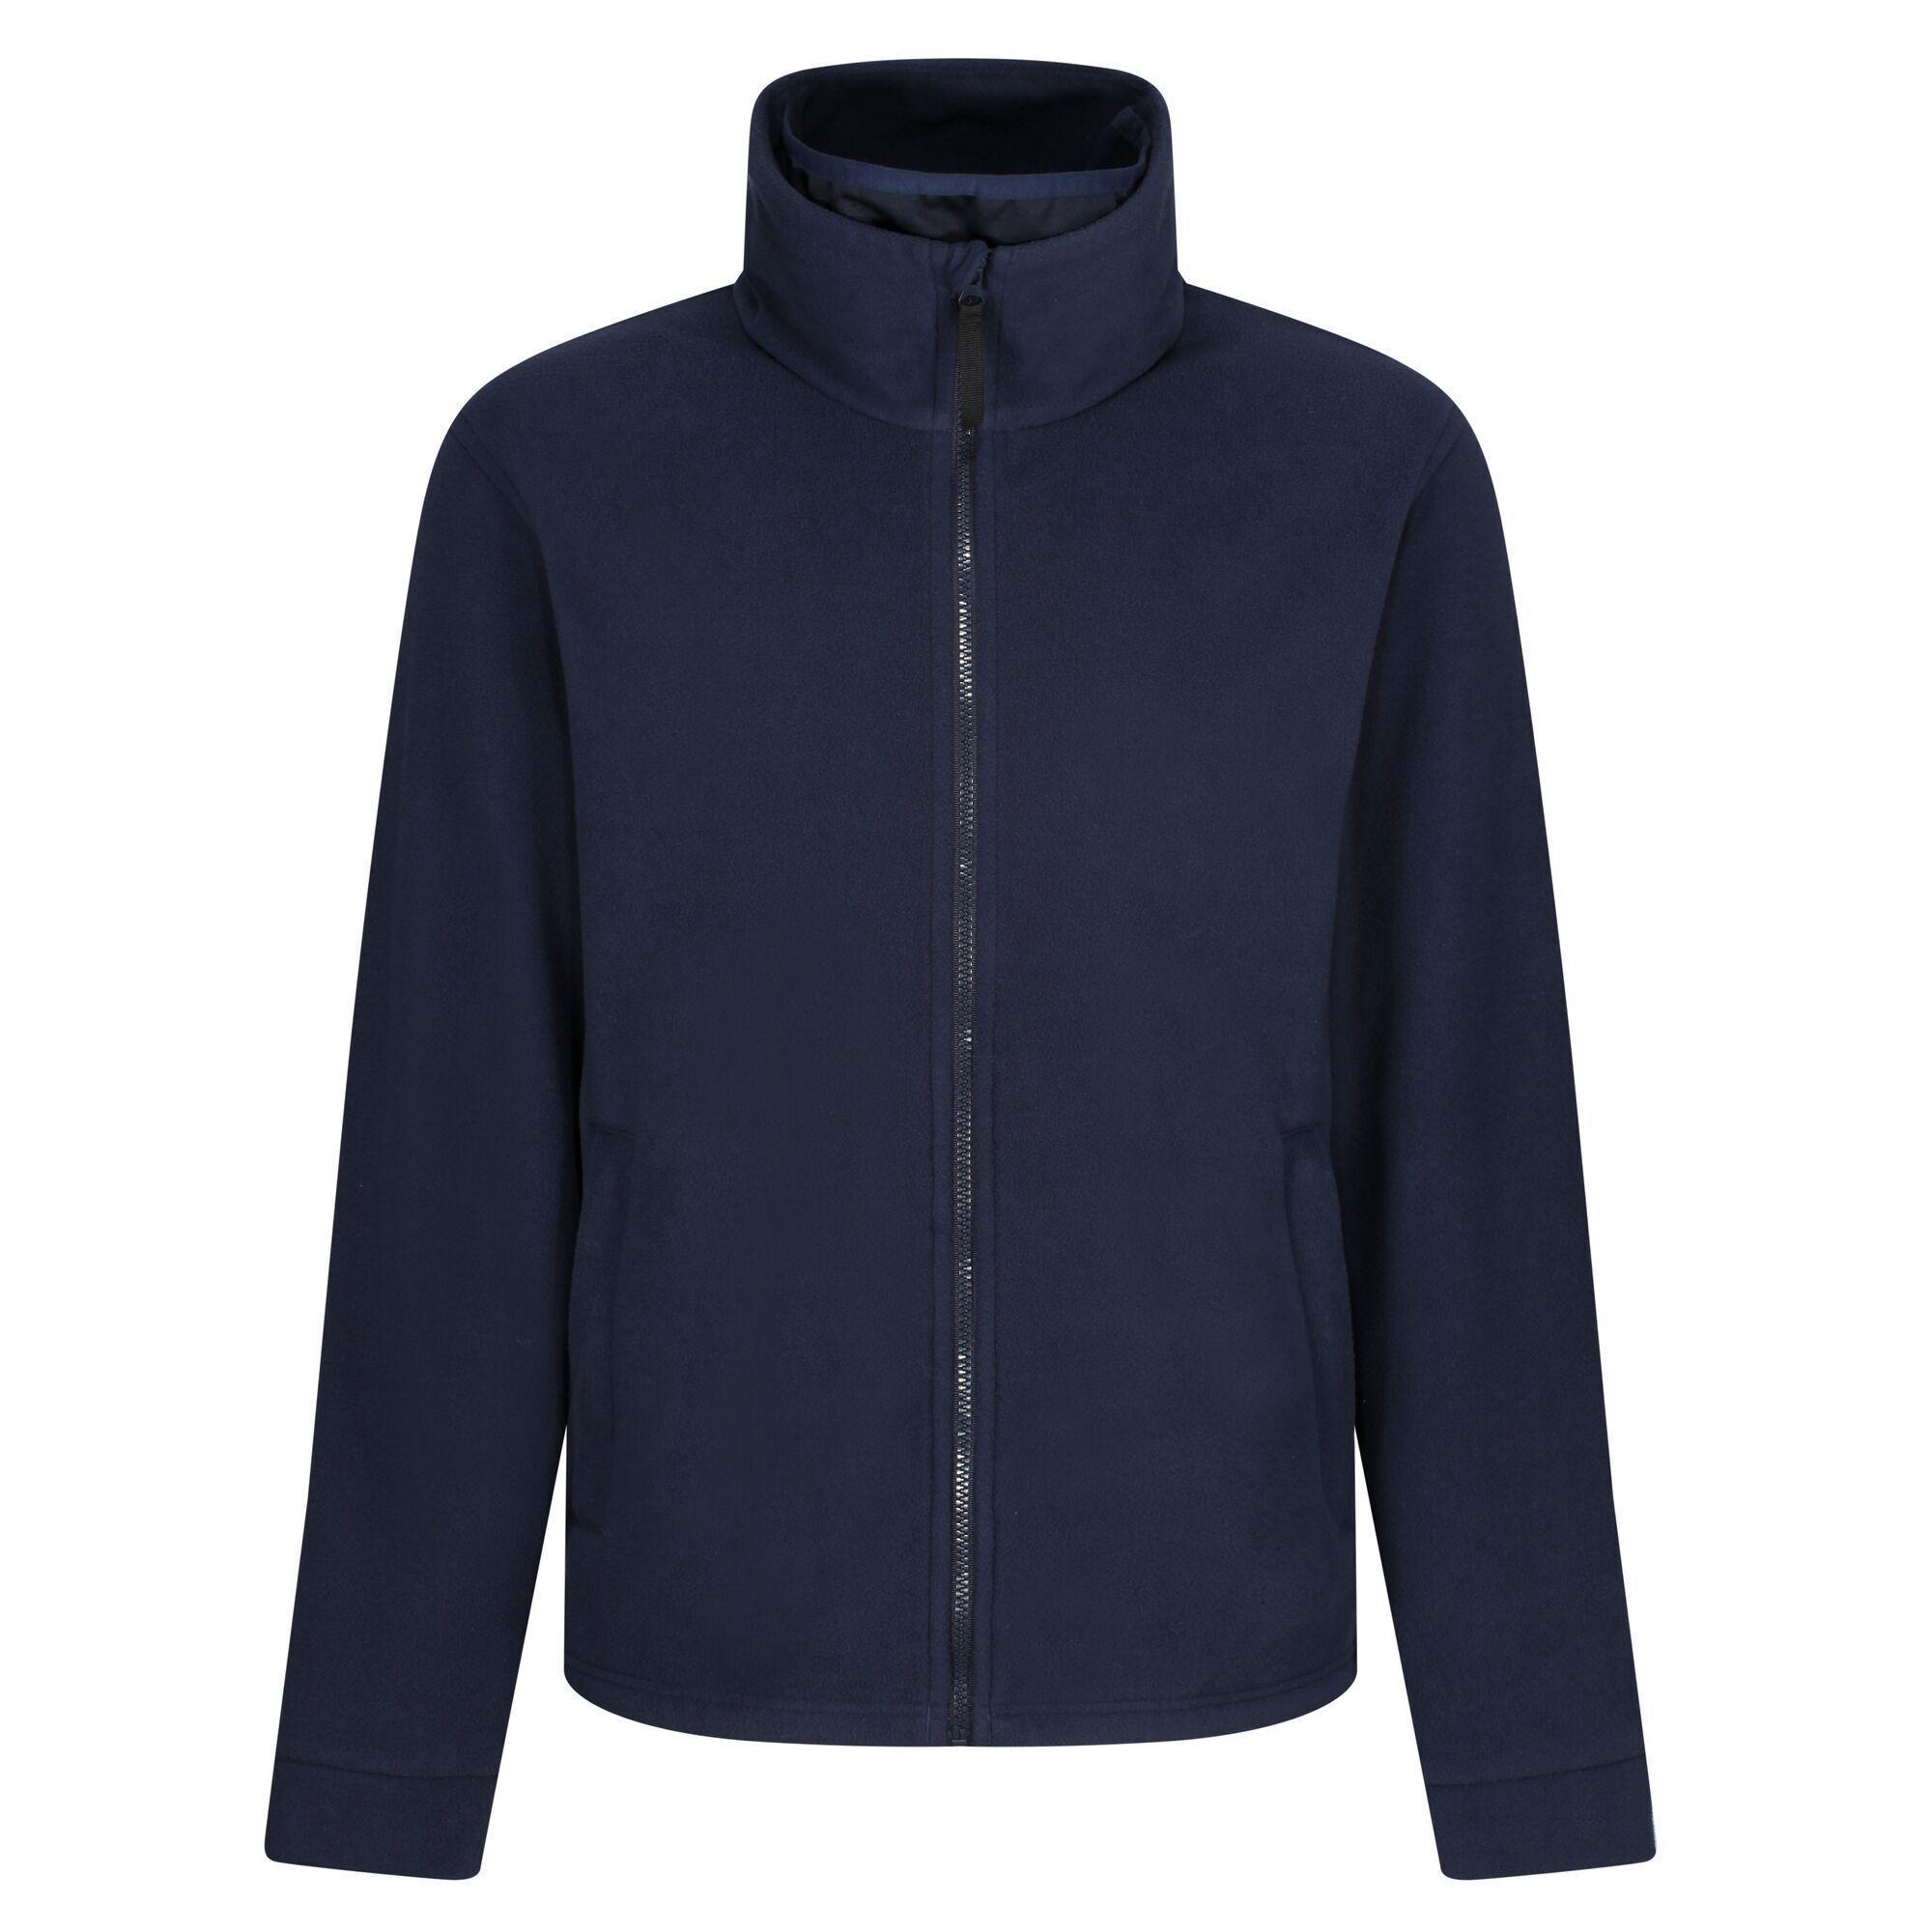 Regatta Mens Pro Cover Up Fleece Jacket (XXL) (Navy)